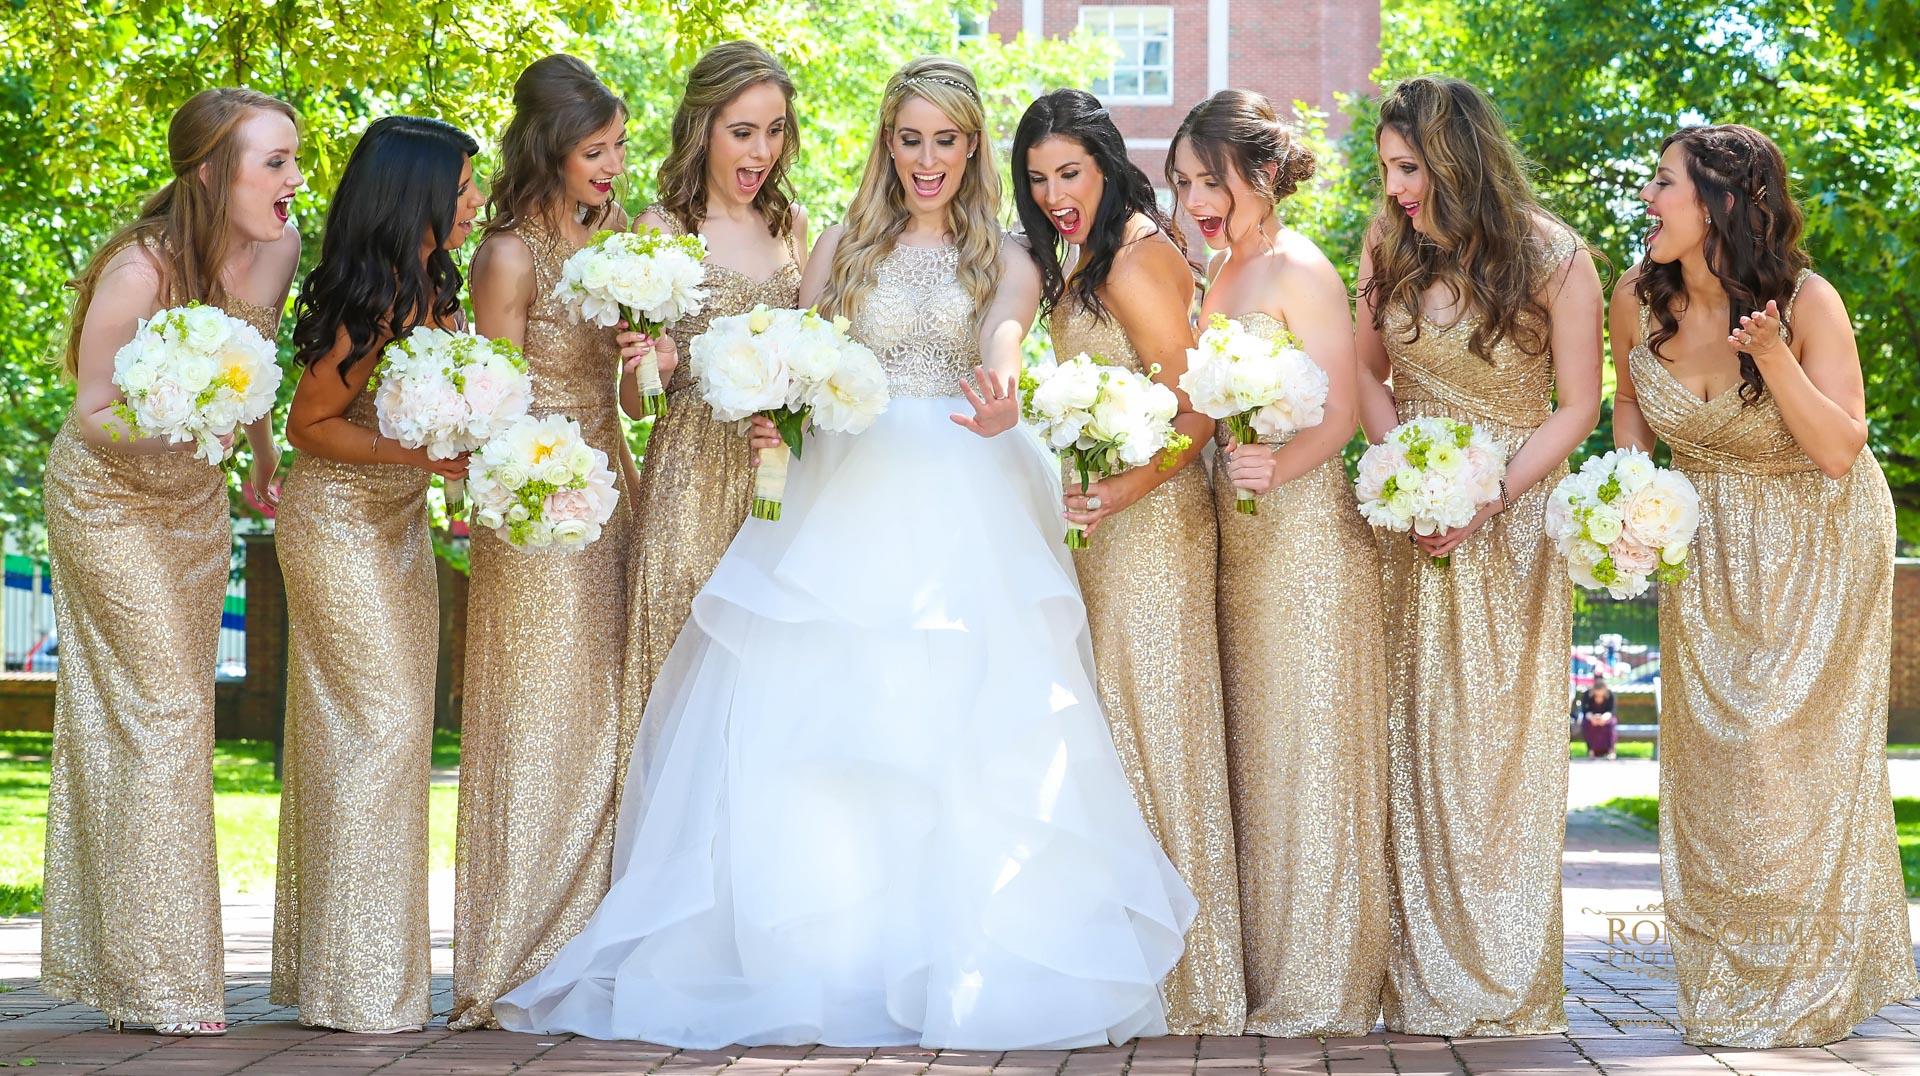 CESCAPHE WEDDING RP 16